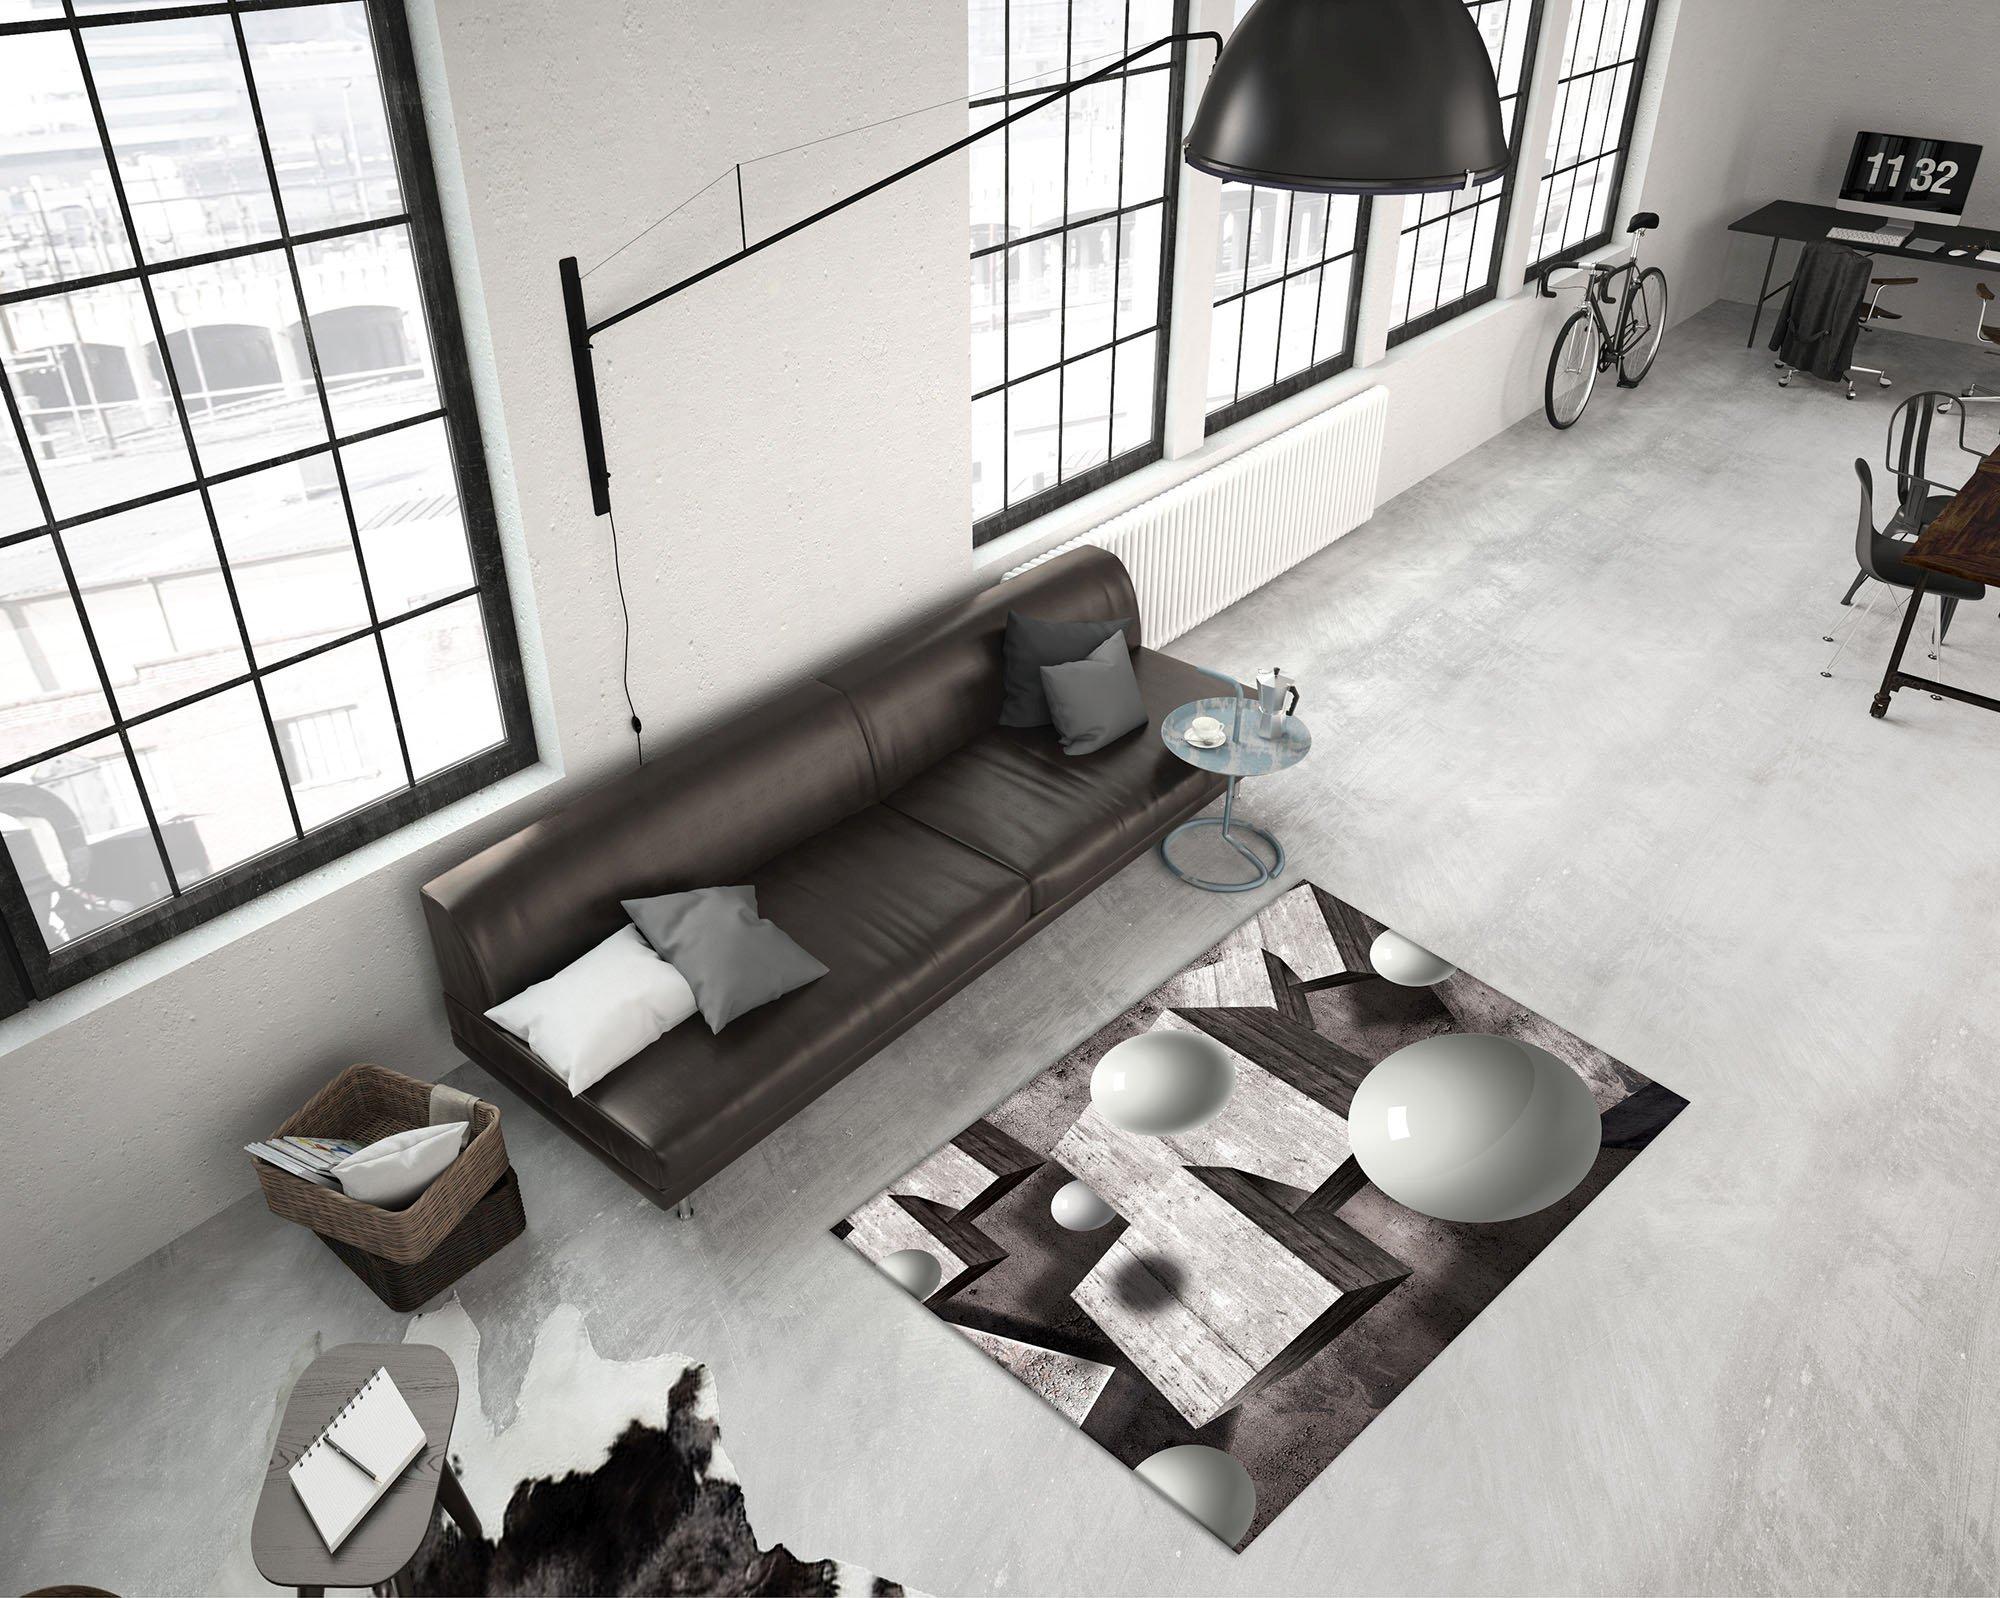 Fußboden Teppich Jupe ~ D pvc fußboden großhandel d boden tapeten marmorparkett rose